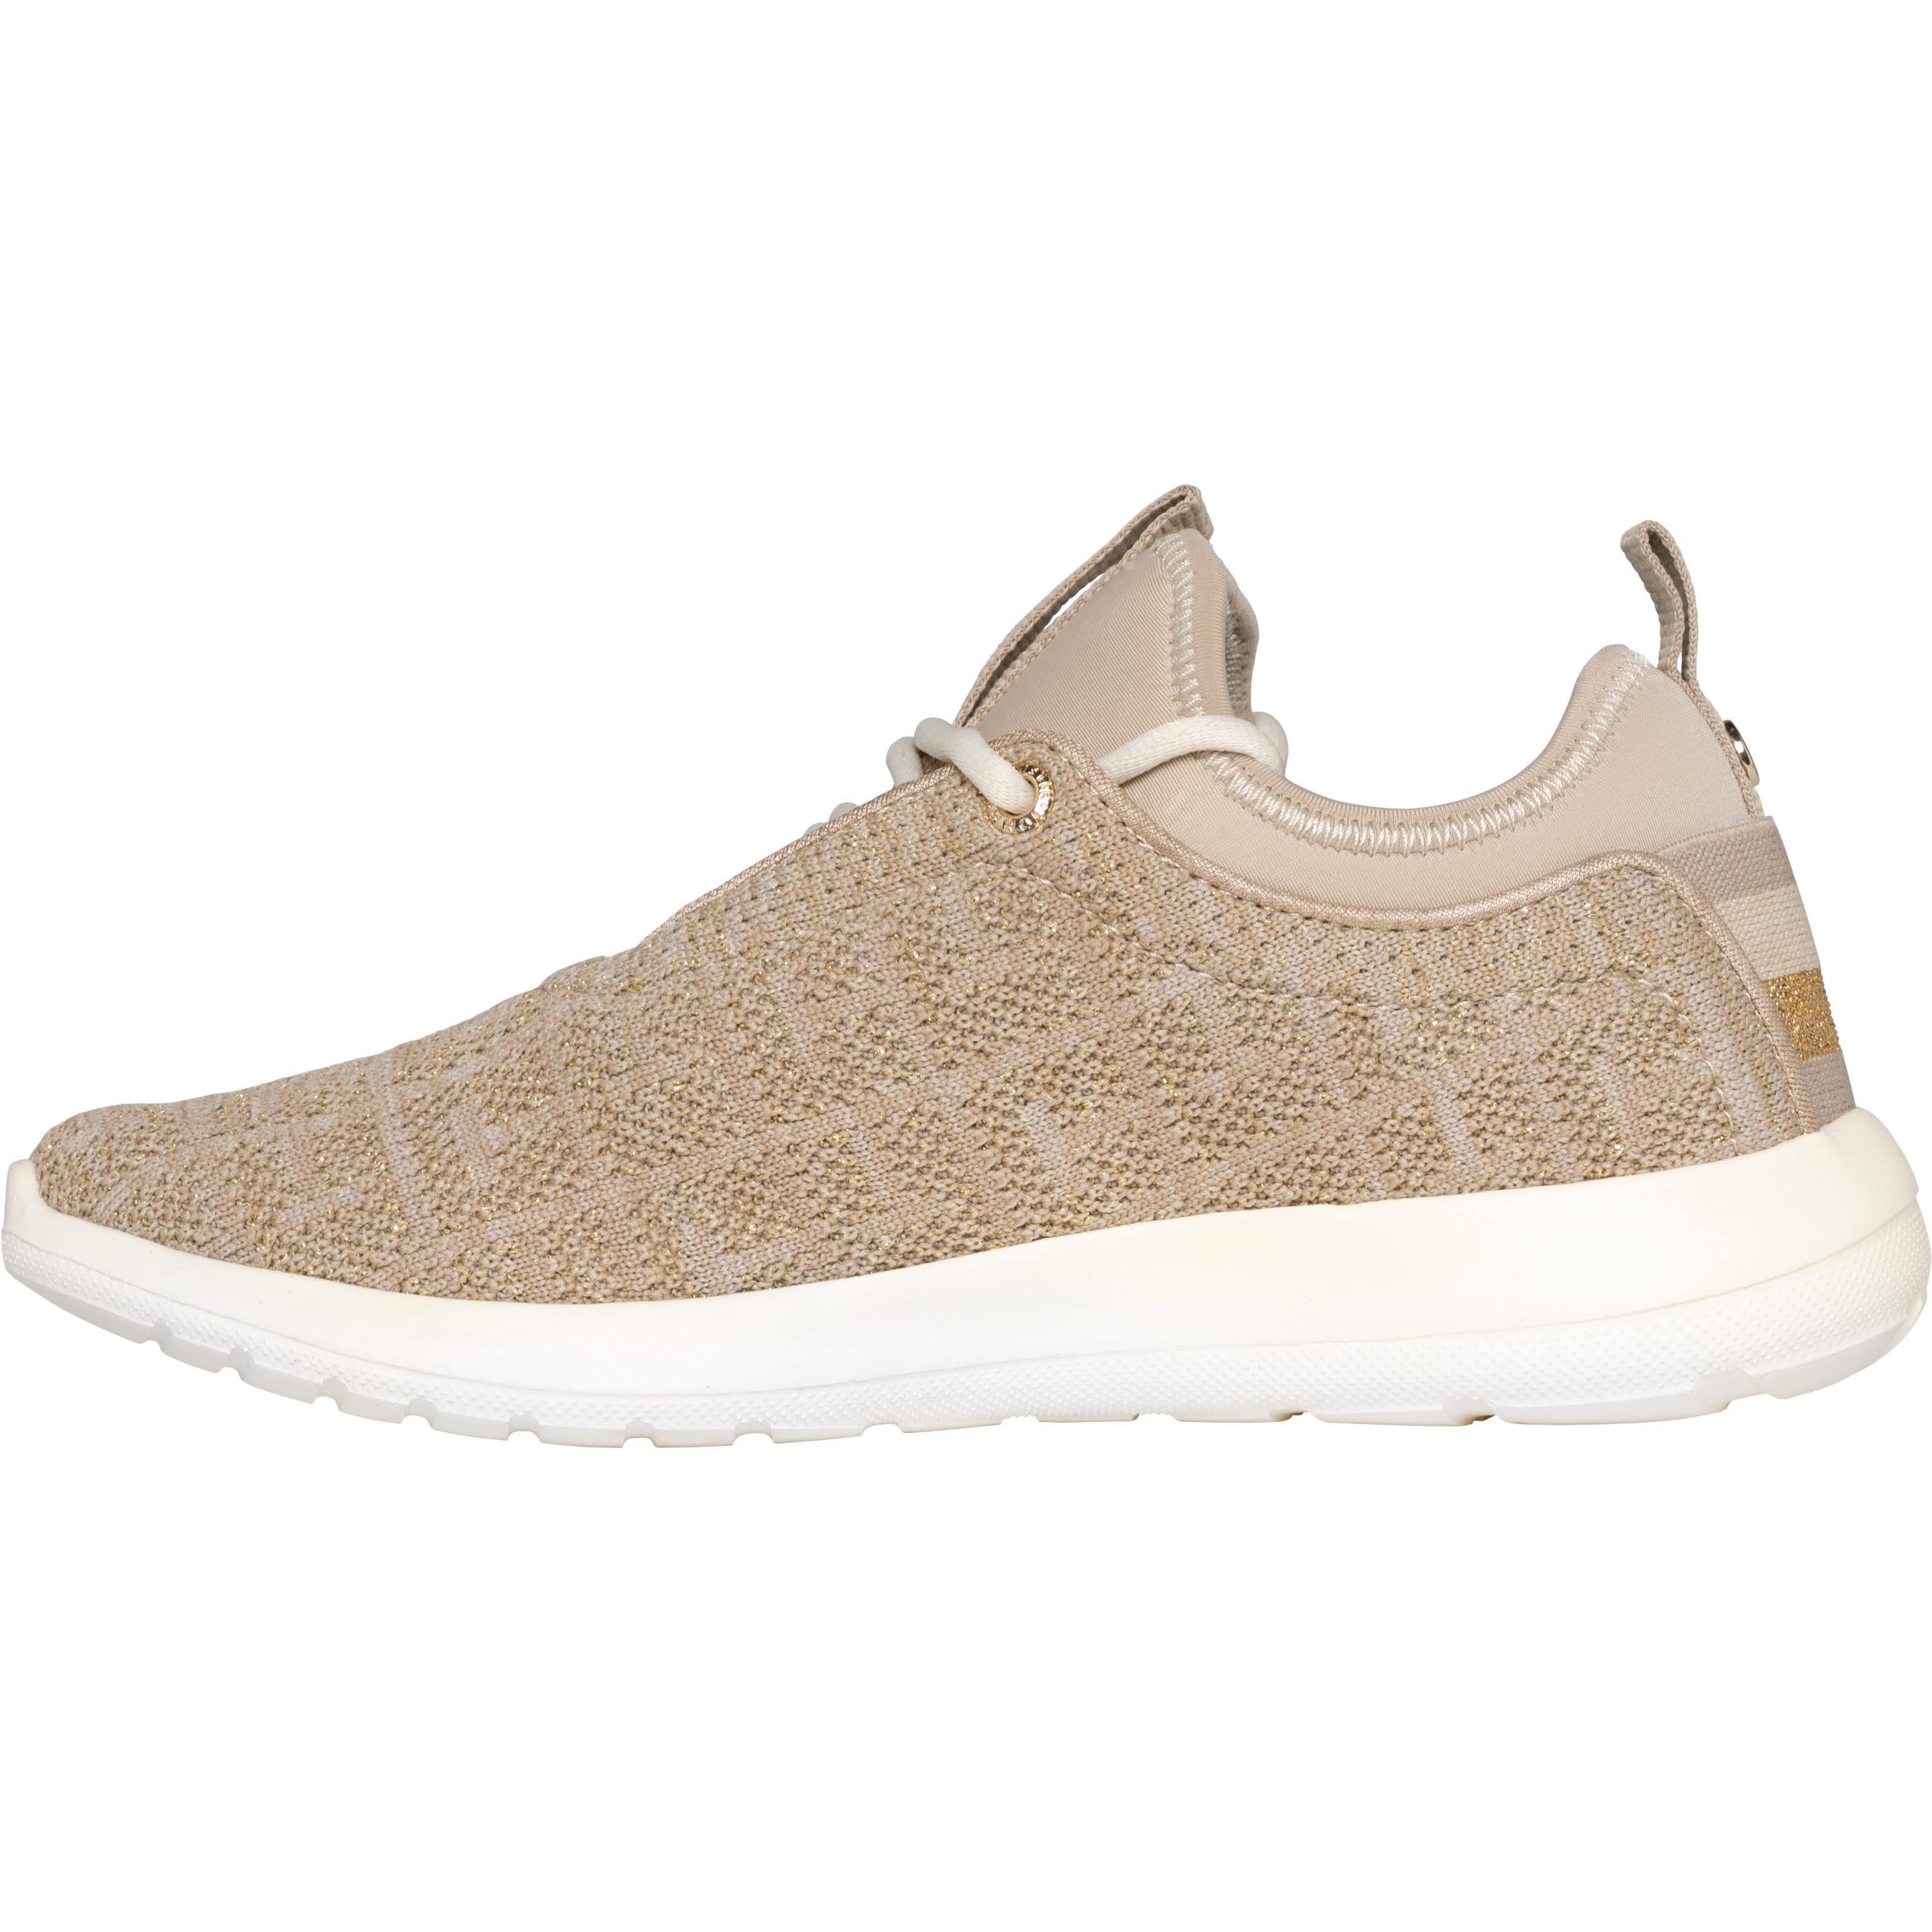 Tommy Hilfiger Sneaker LIGHT WEIGHT SLIP ON SNEAKER online kaufen  COBBLESTONE